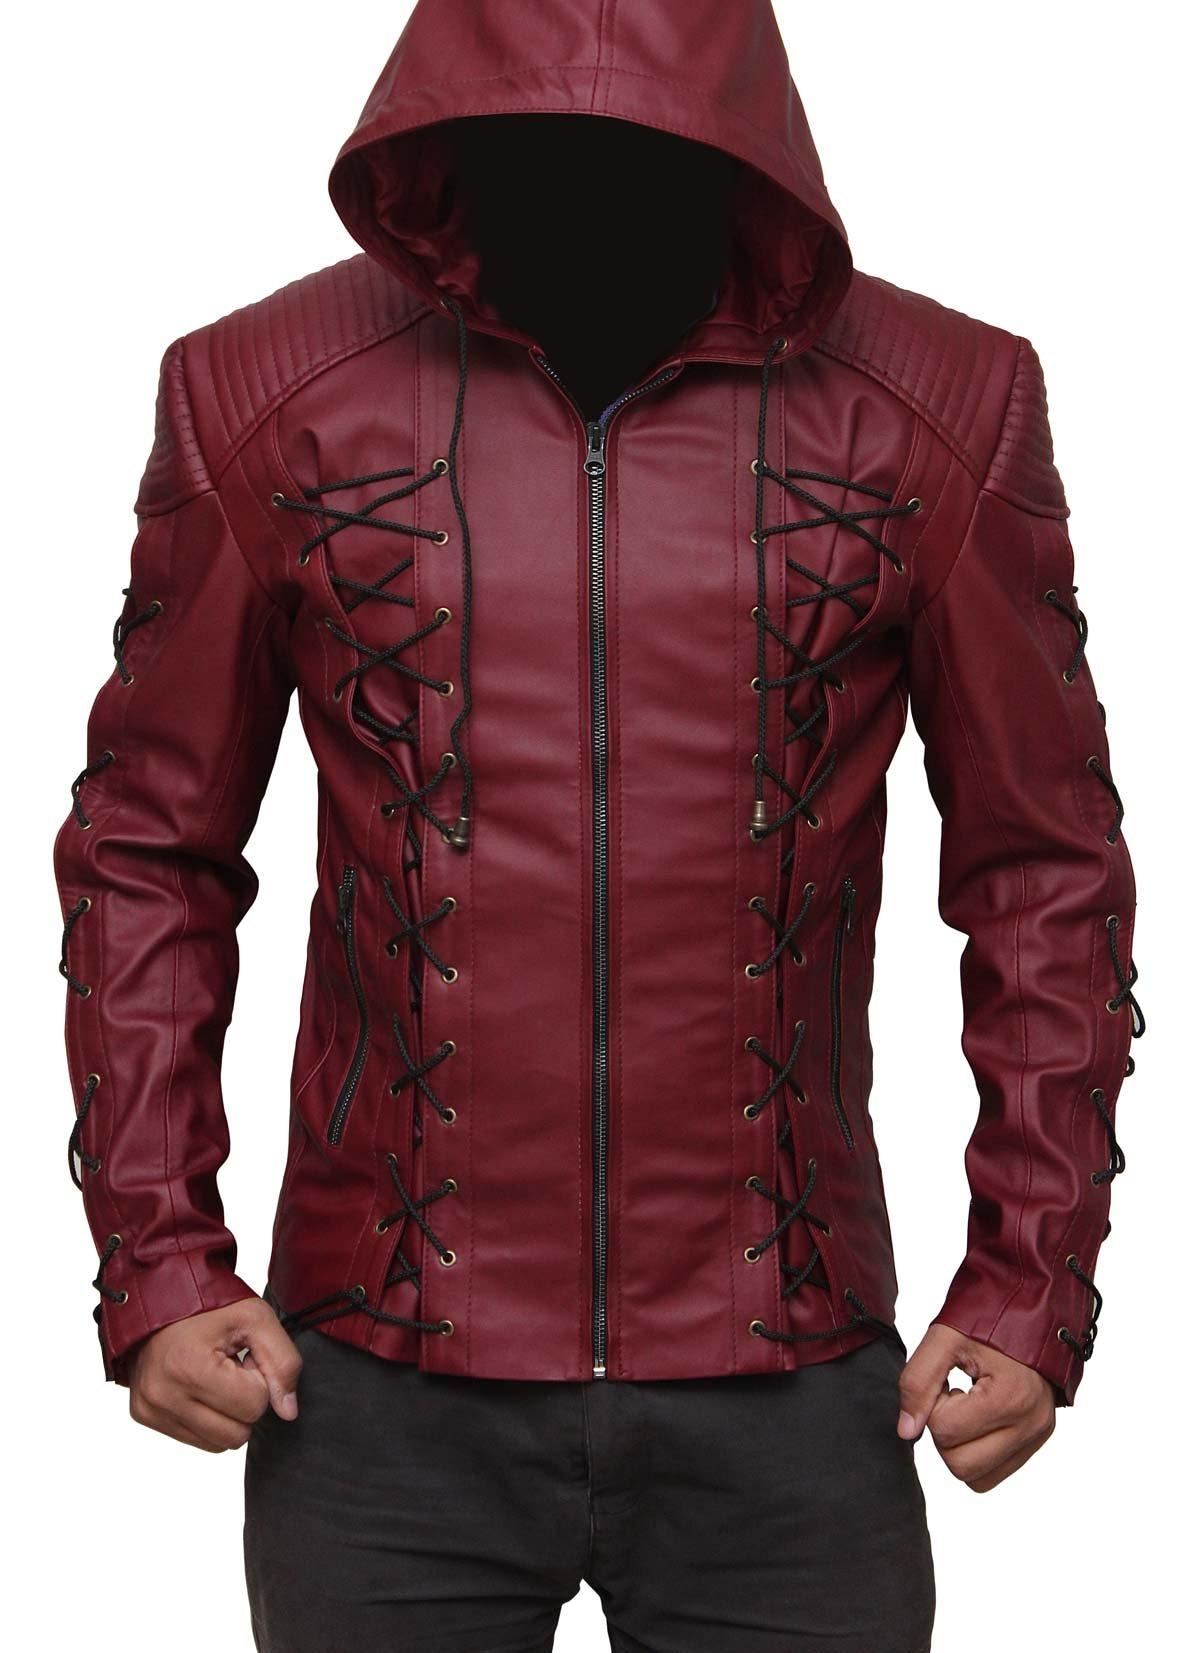 Arrow Red outerwear Jacket Gift Ideas M